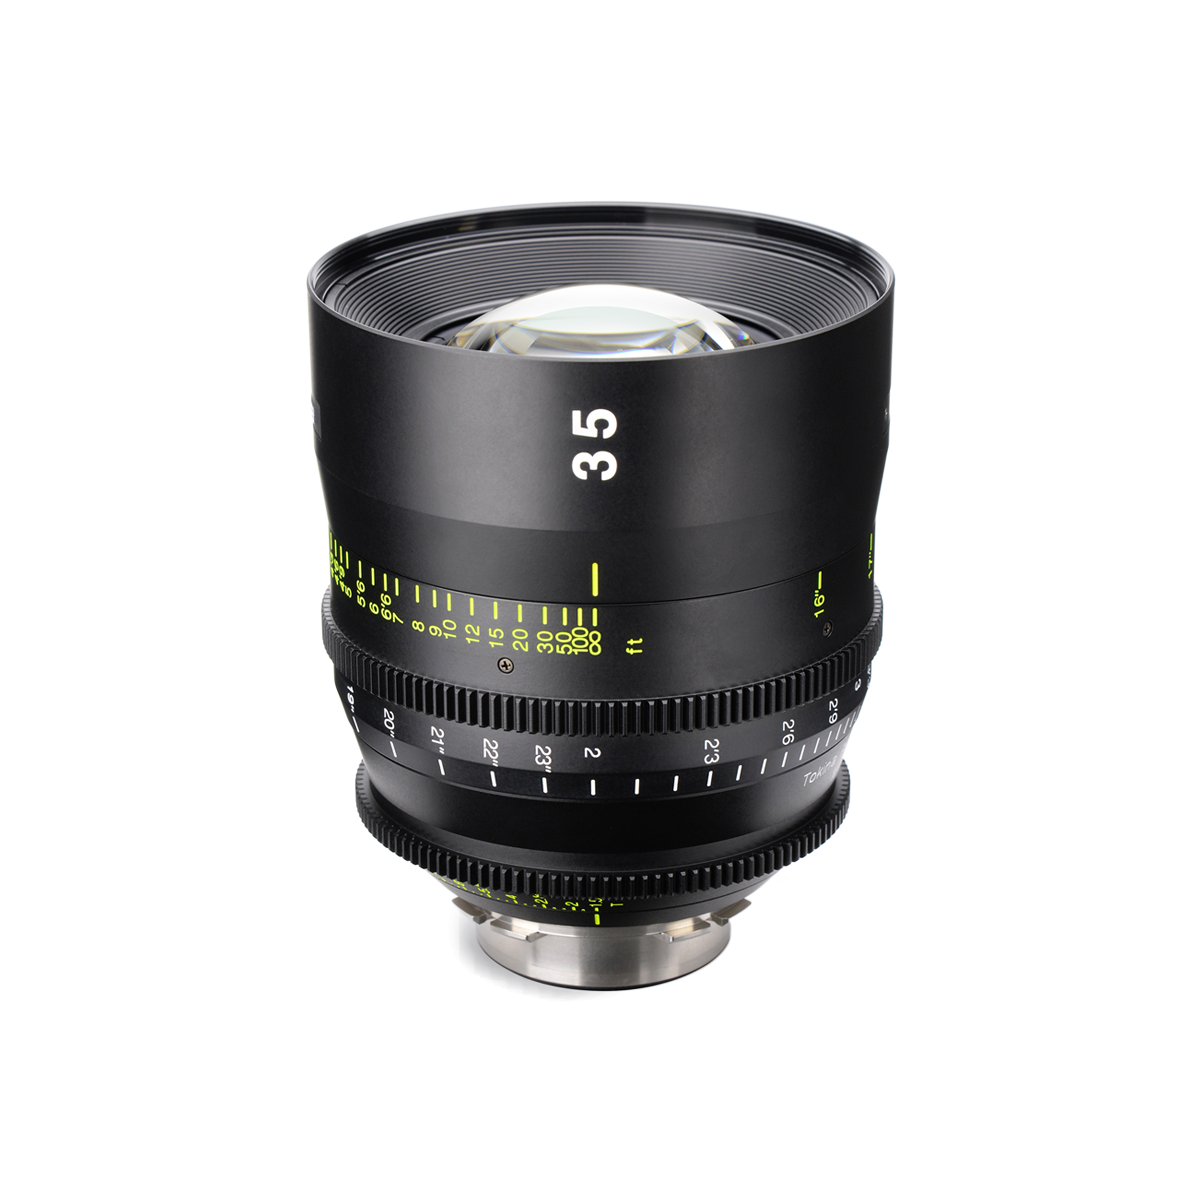 TOKINA - AT-X 35mm T1,5 monture Micro 4/3 - Objectif Cinéma